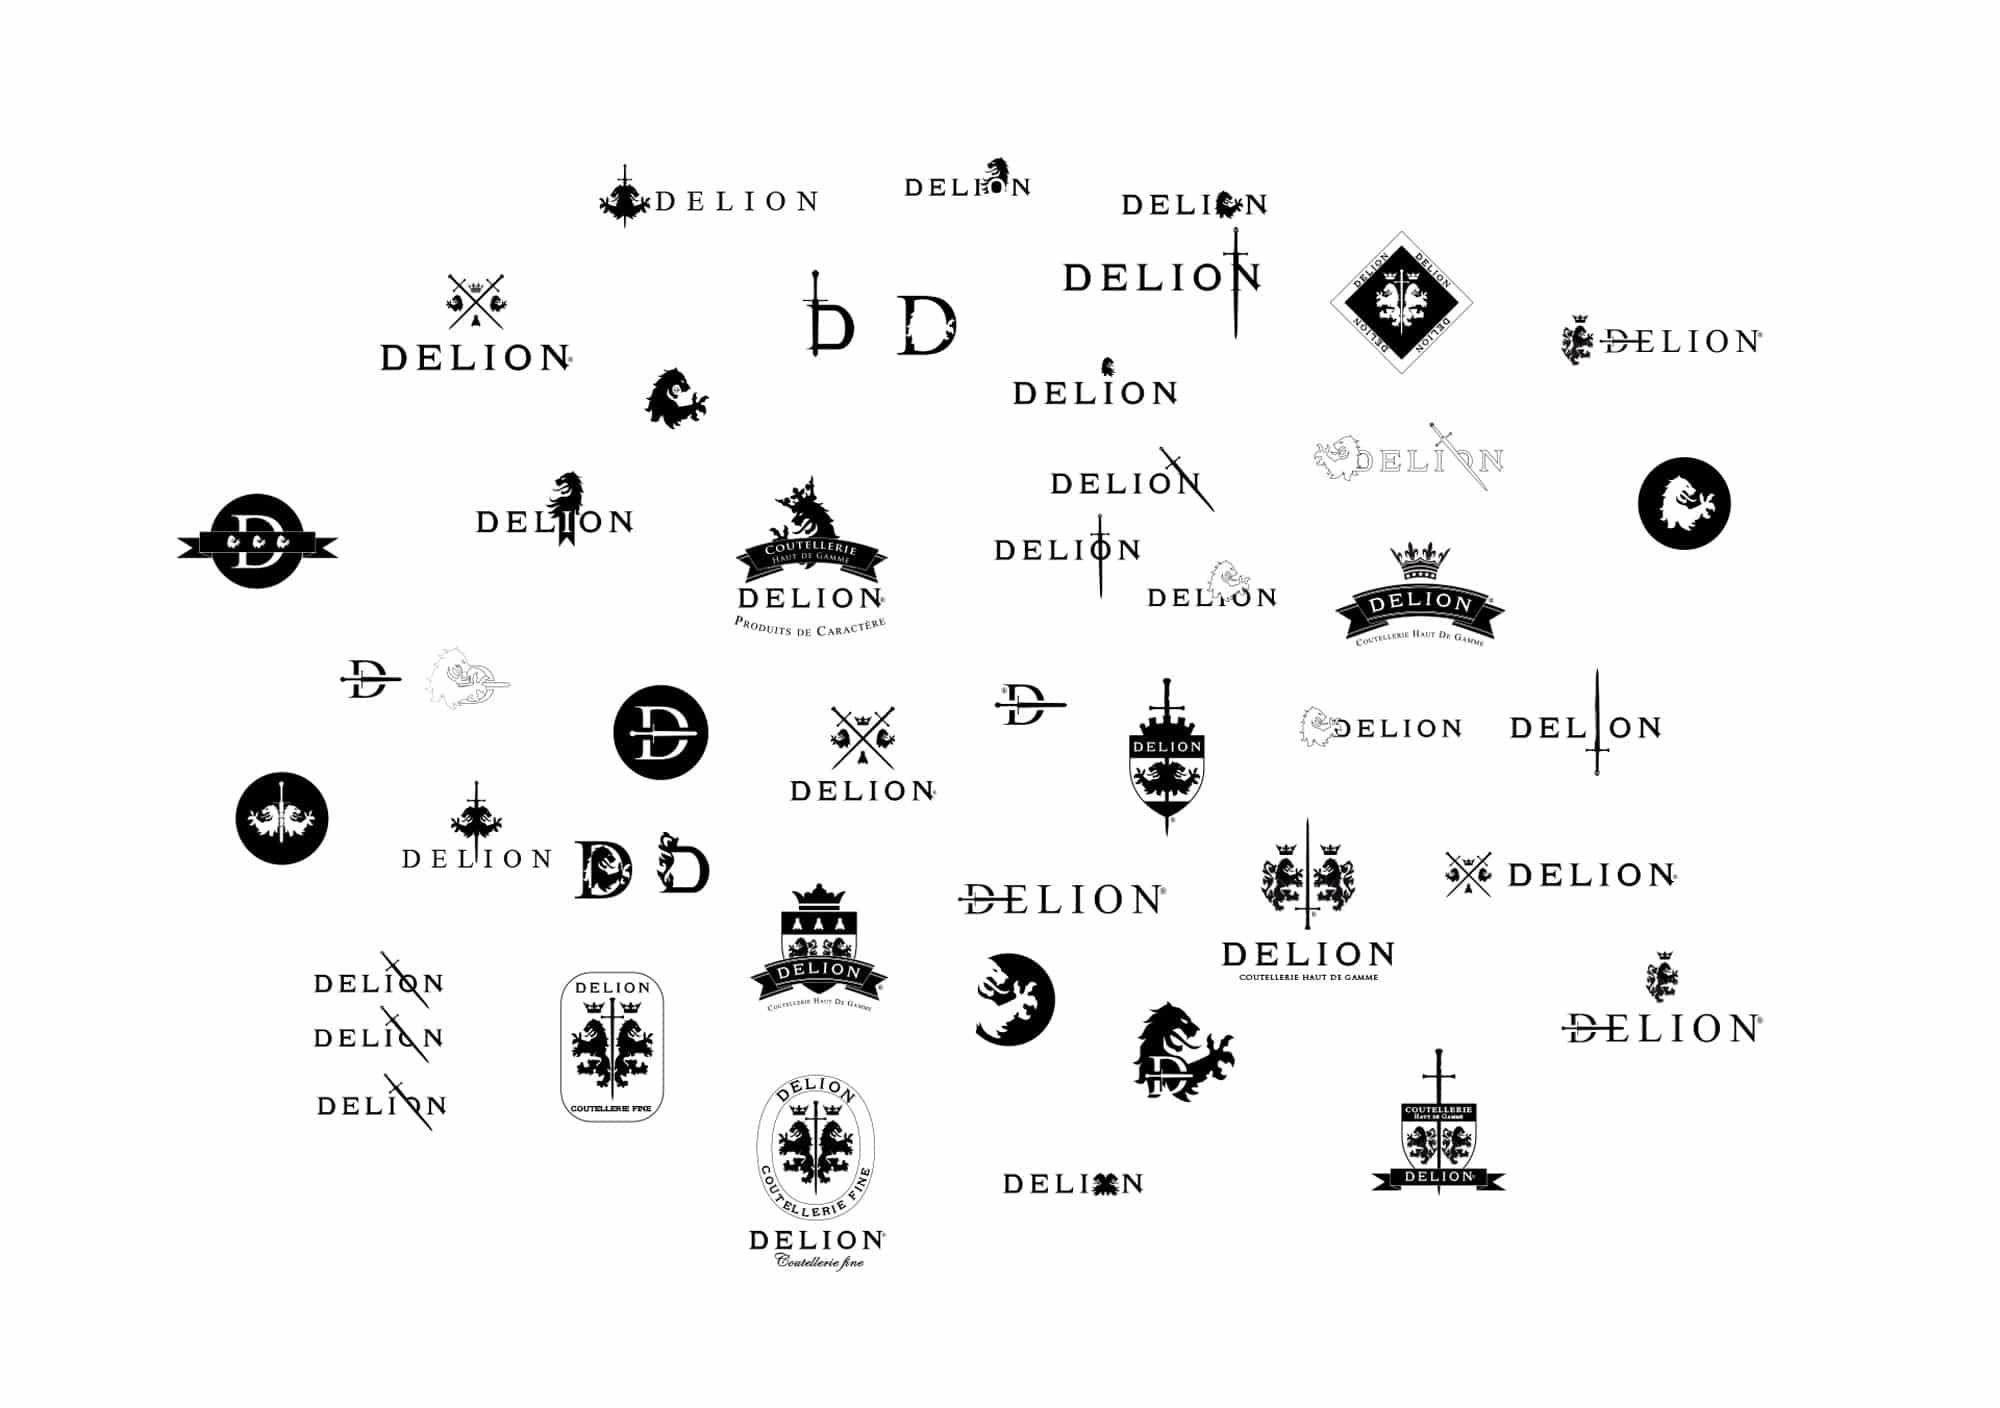 Creative board, logo ideas